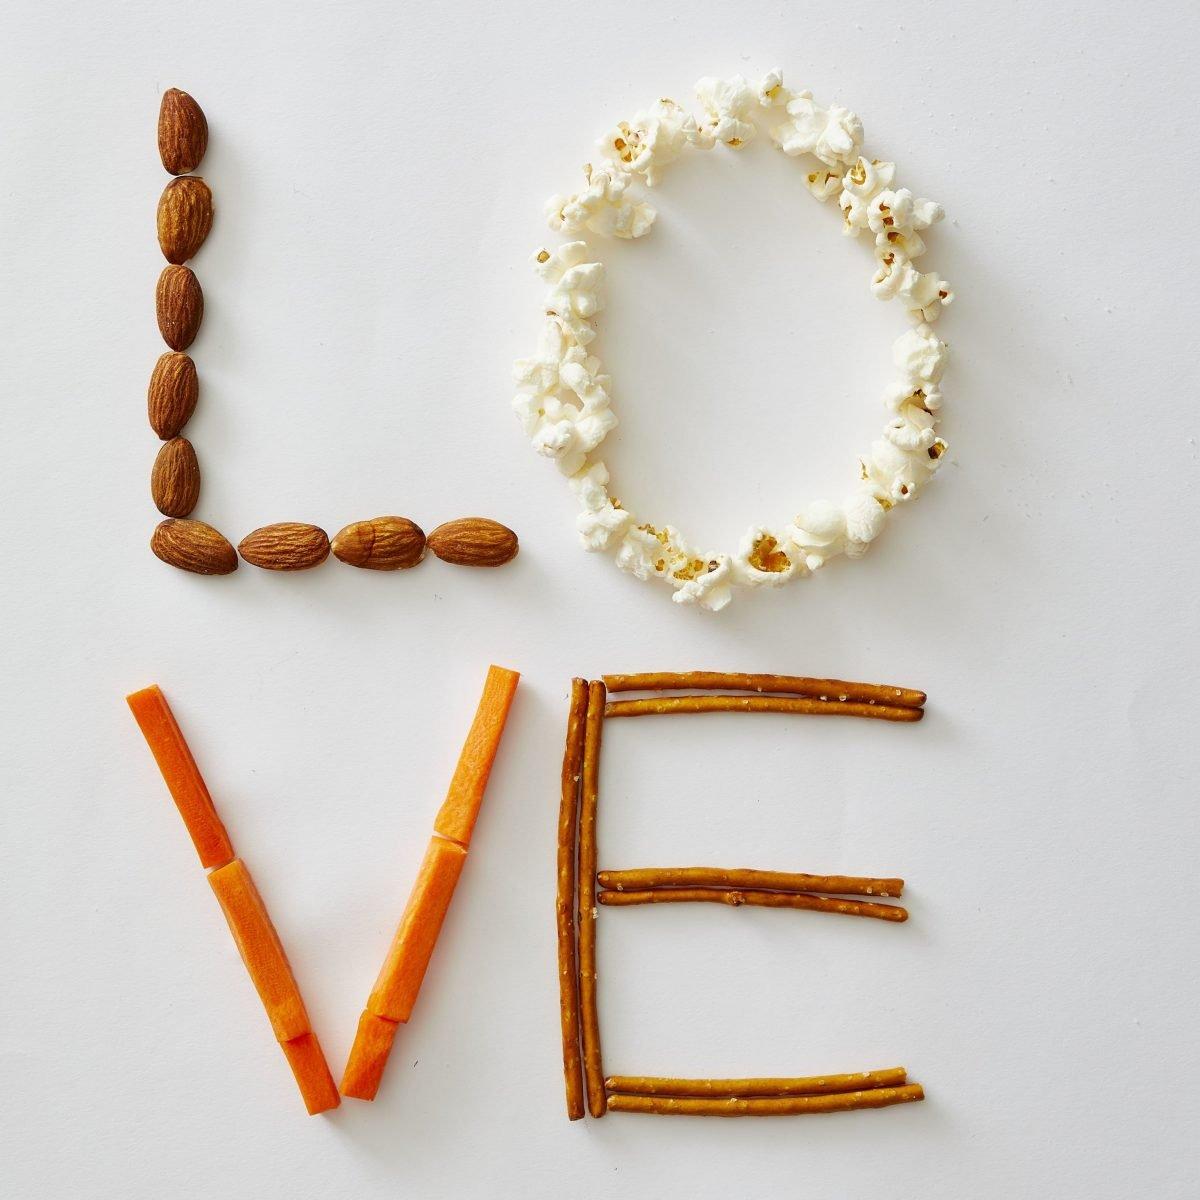 Darcy Miller Designs, L-O-V-E (savory), After school snack, Valentines, healthy treat, pretzels, carrots, popcorn, almonds, nuts, easy valentine, Darcy Miller, DIY